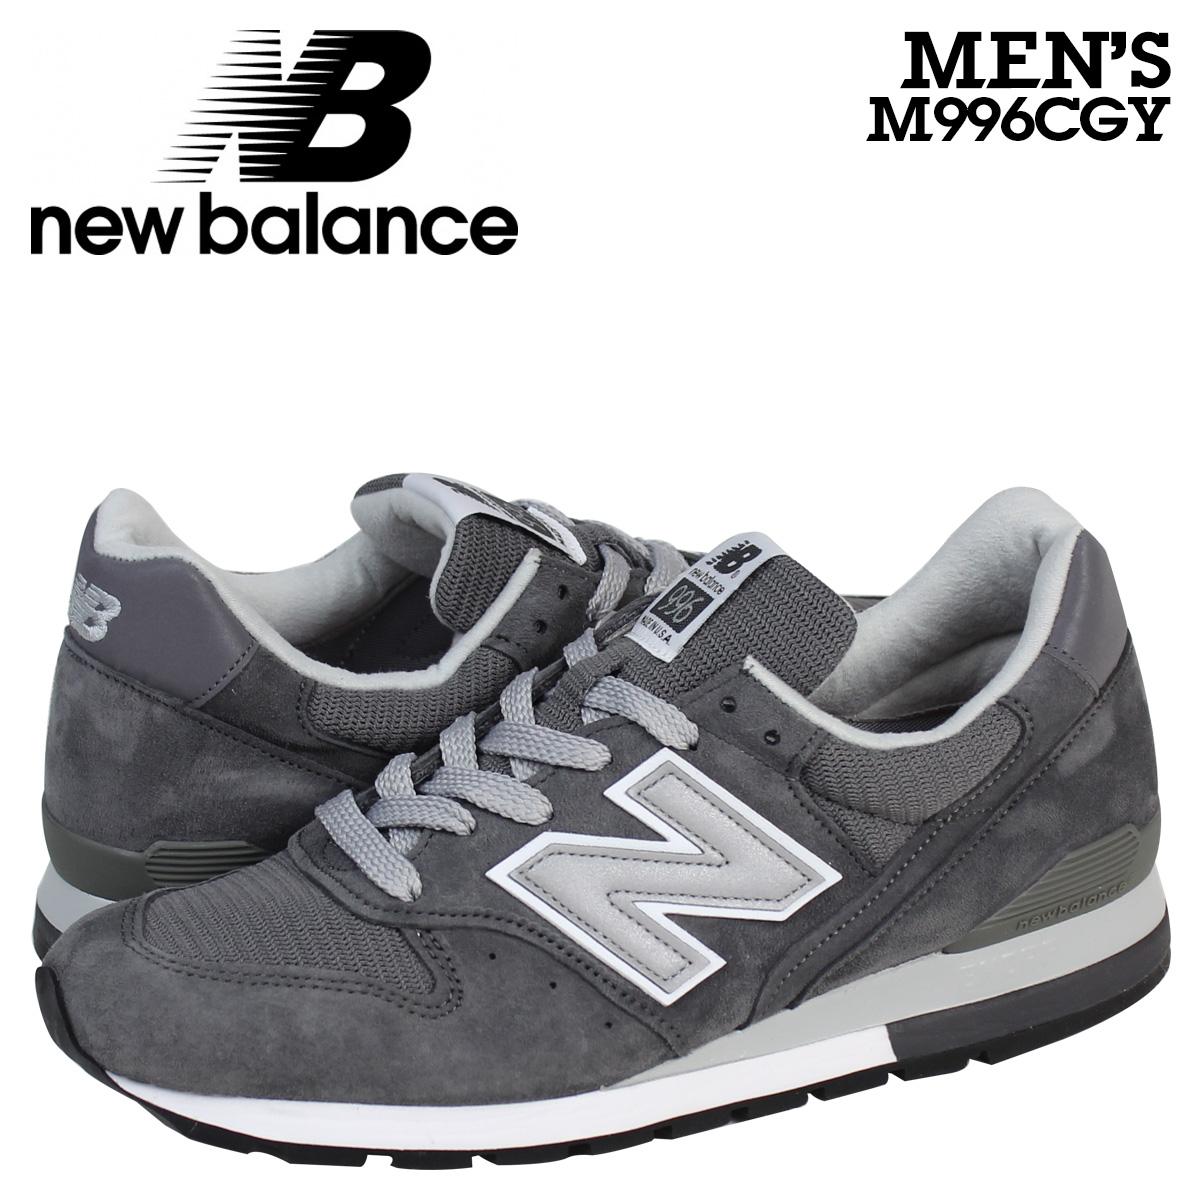 new balance men 996